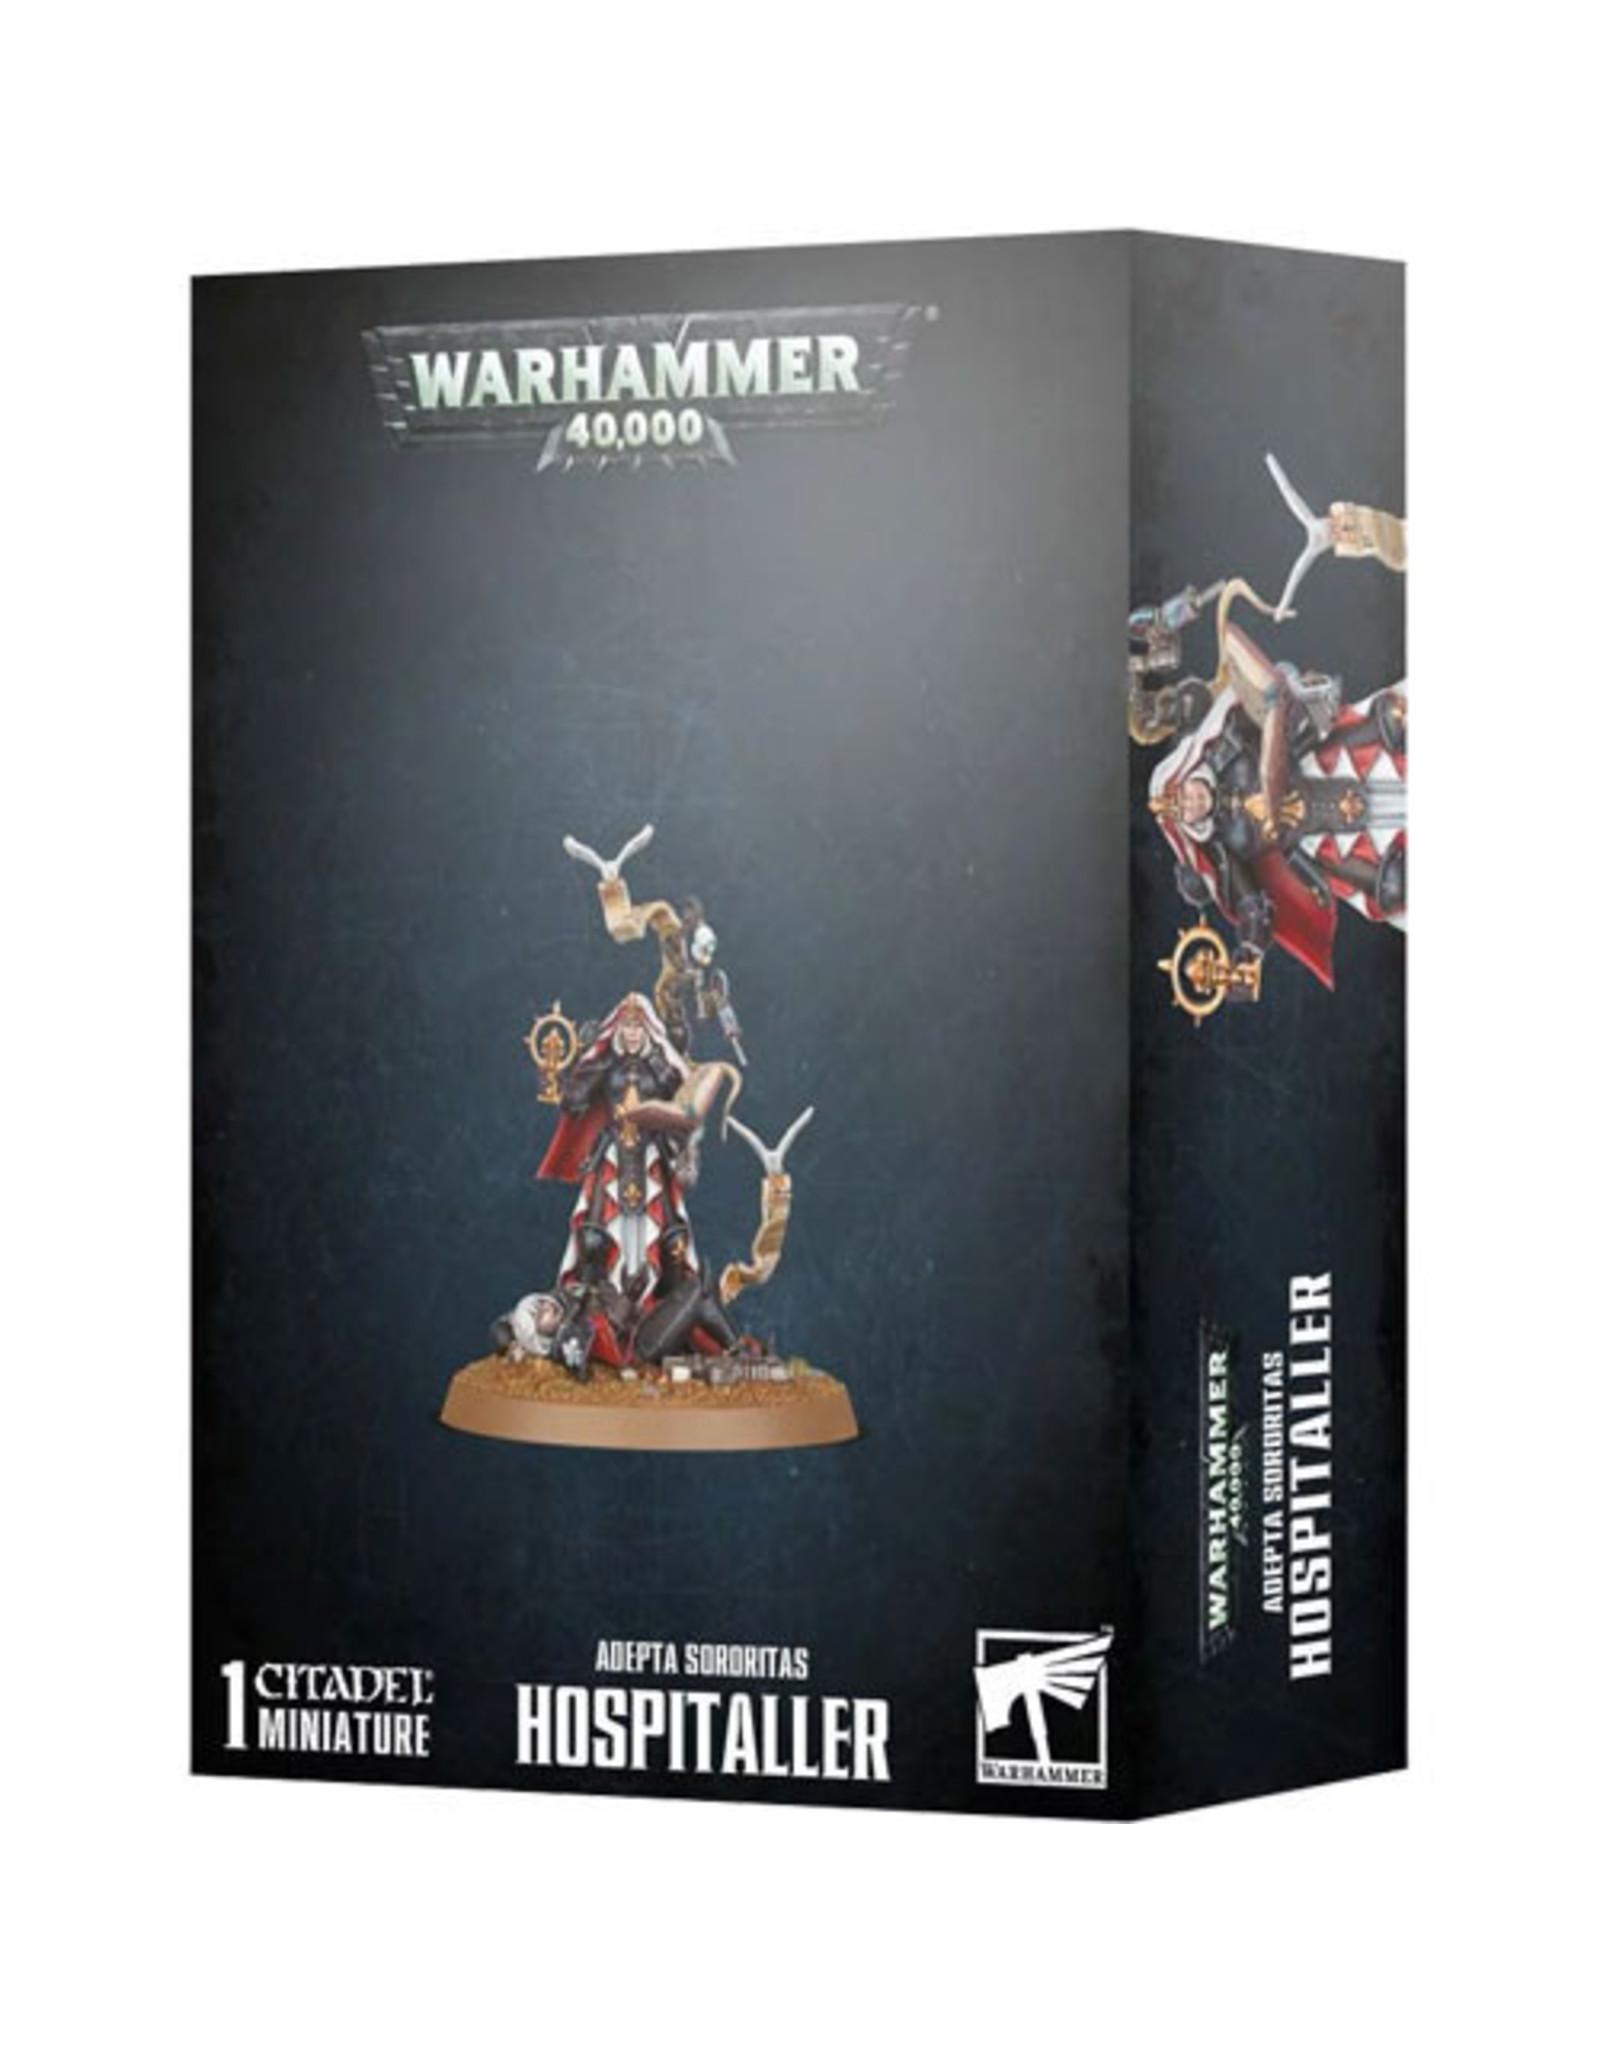 Warhammer 40K Adepta Sororitas Hospitaller